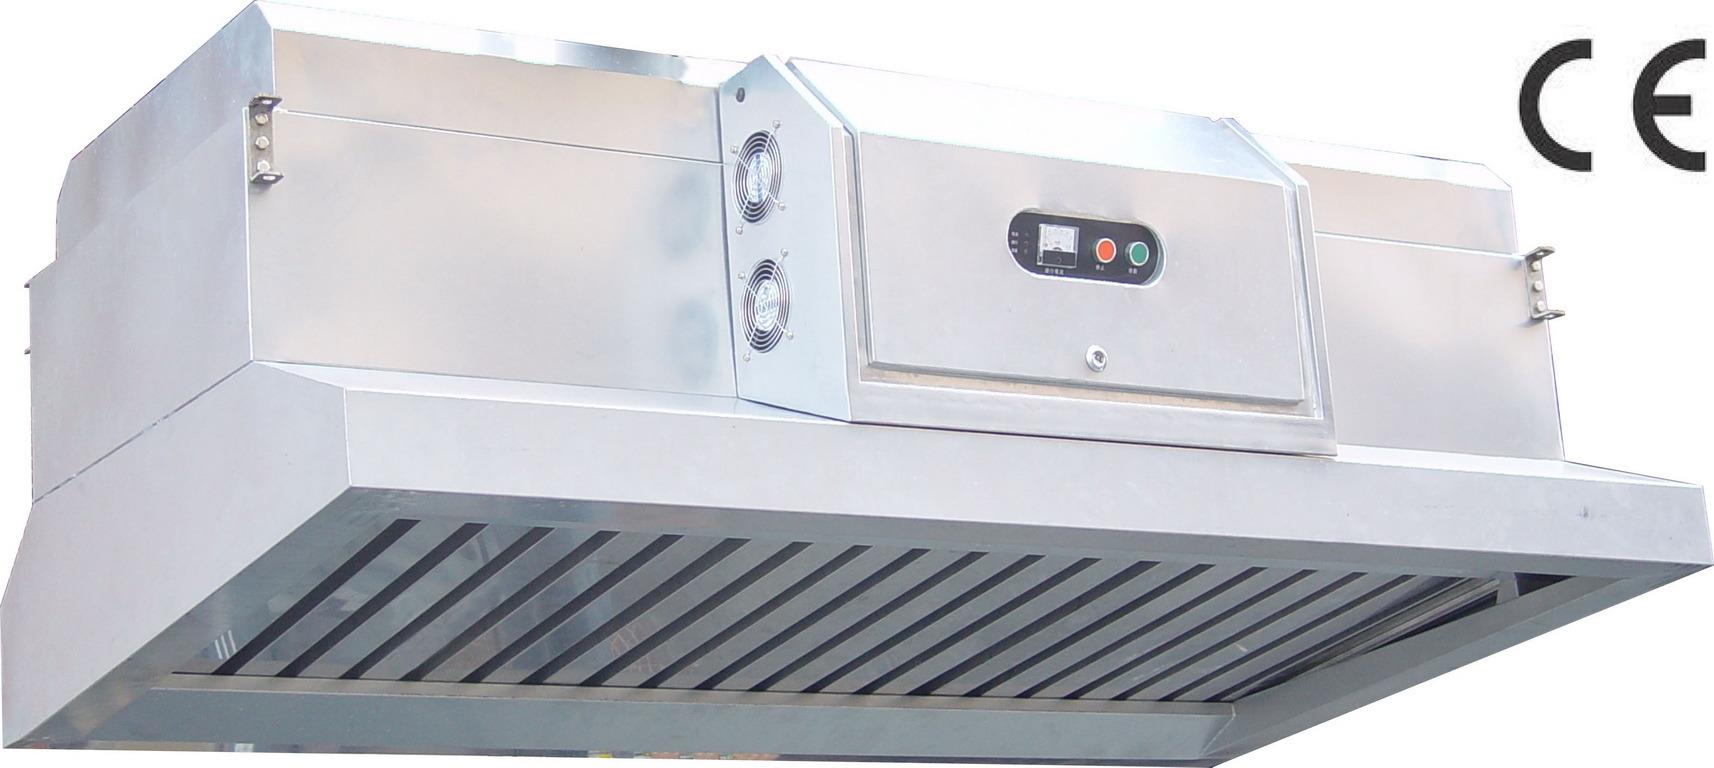 kitchen ventilation system menu board china electrostatic cooking hood style eliminator with